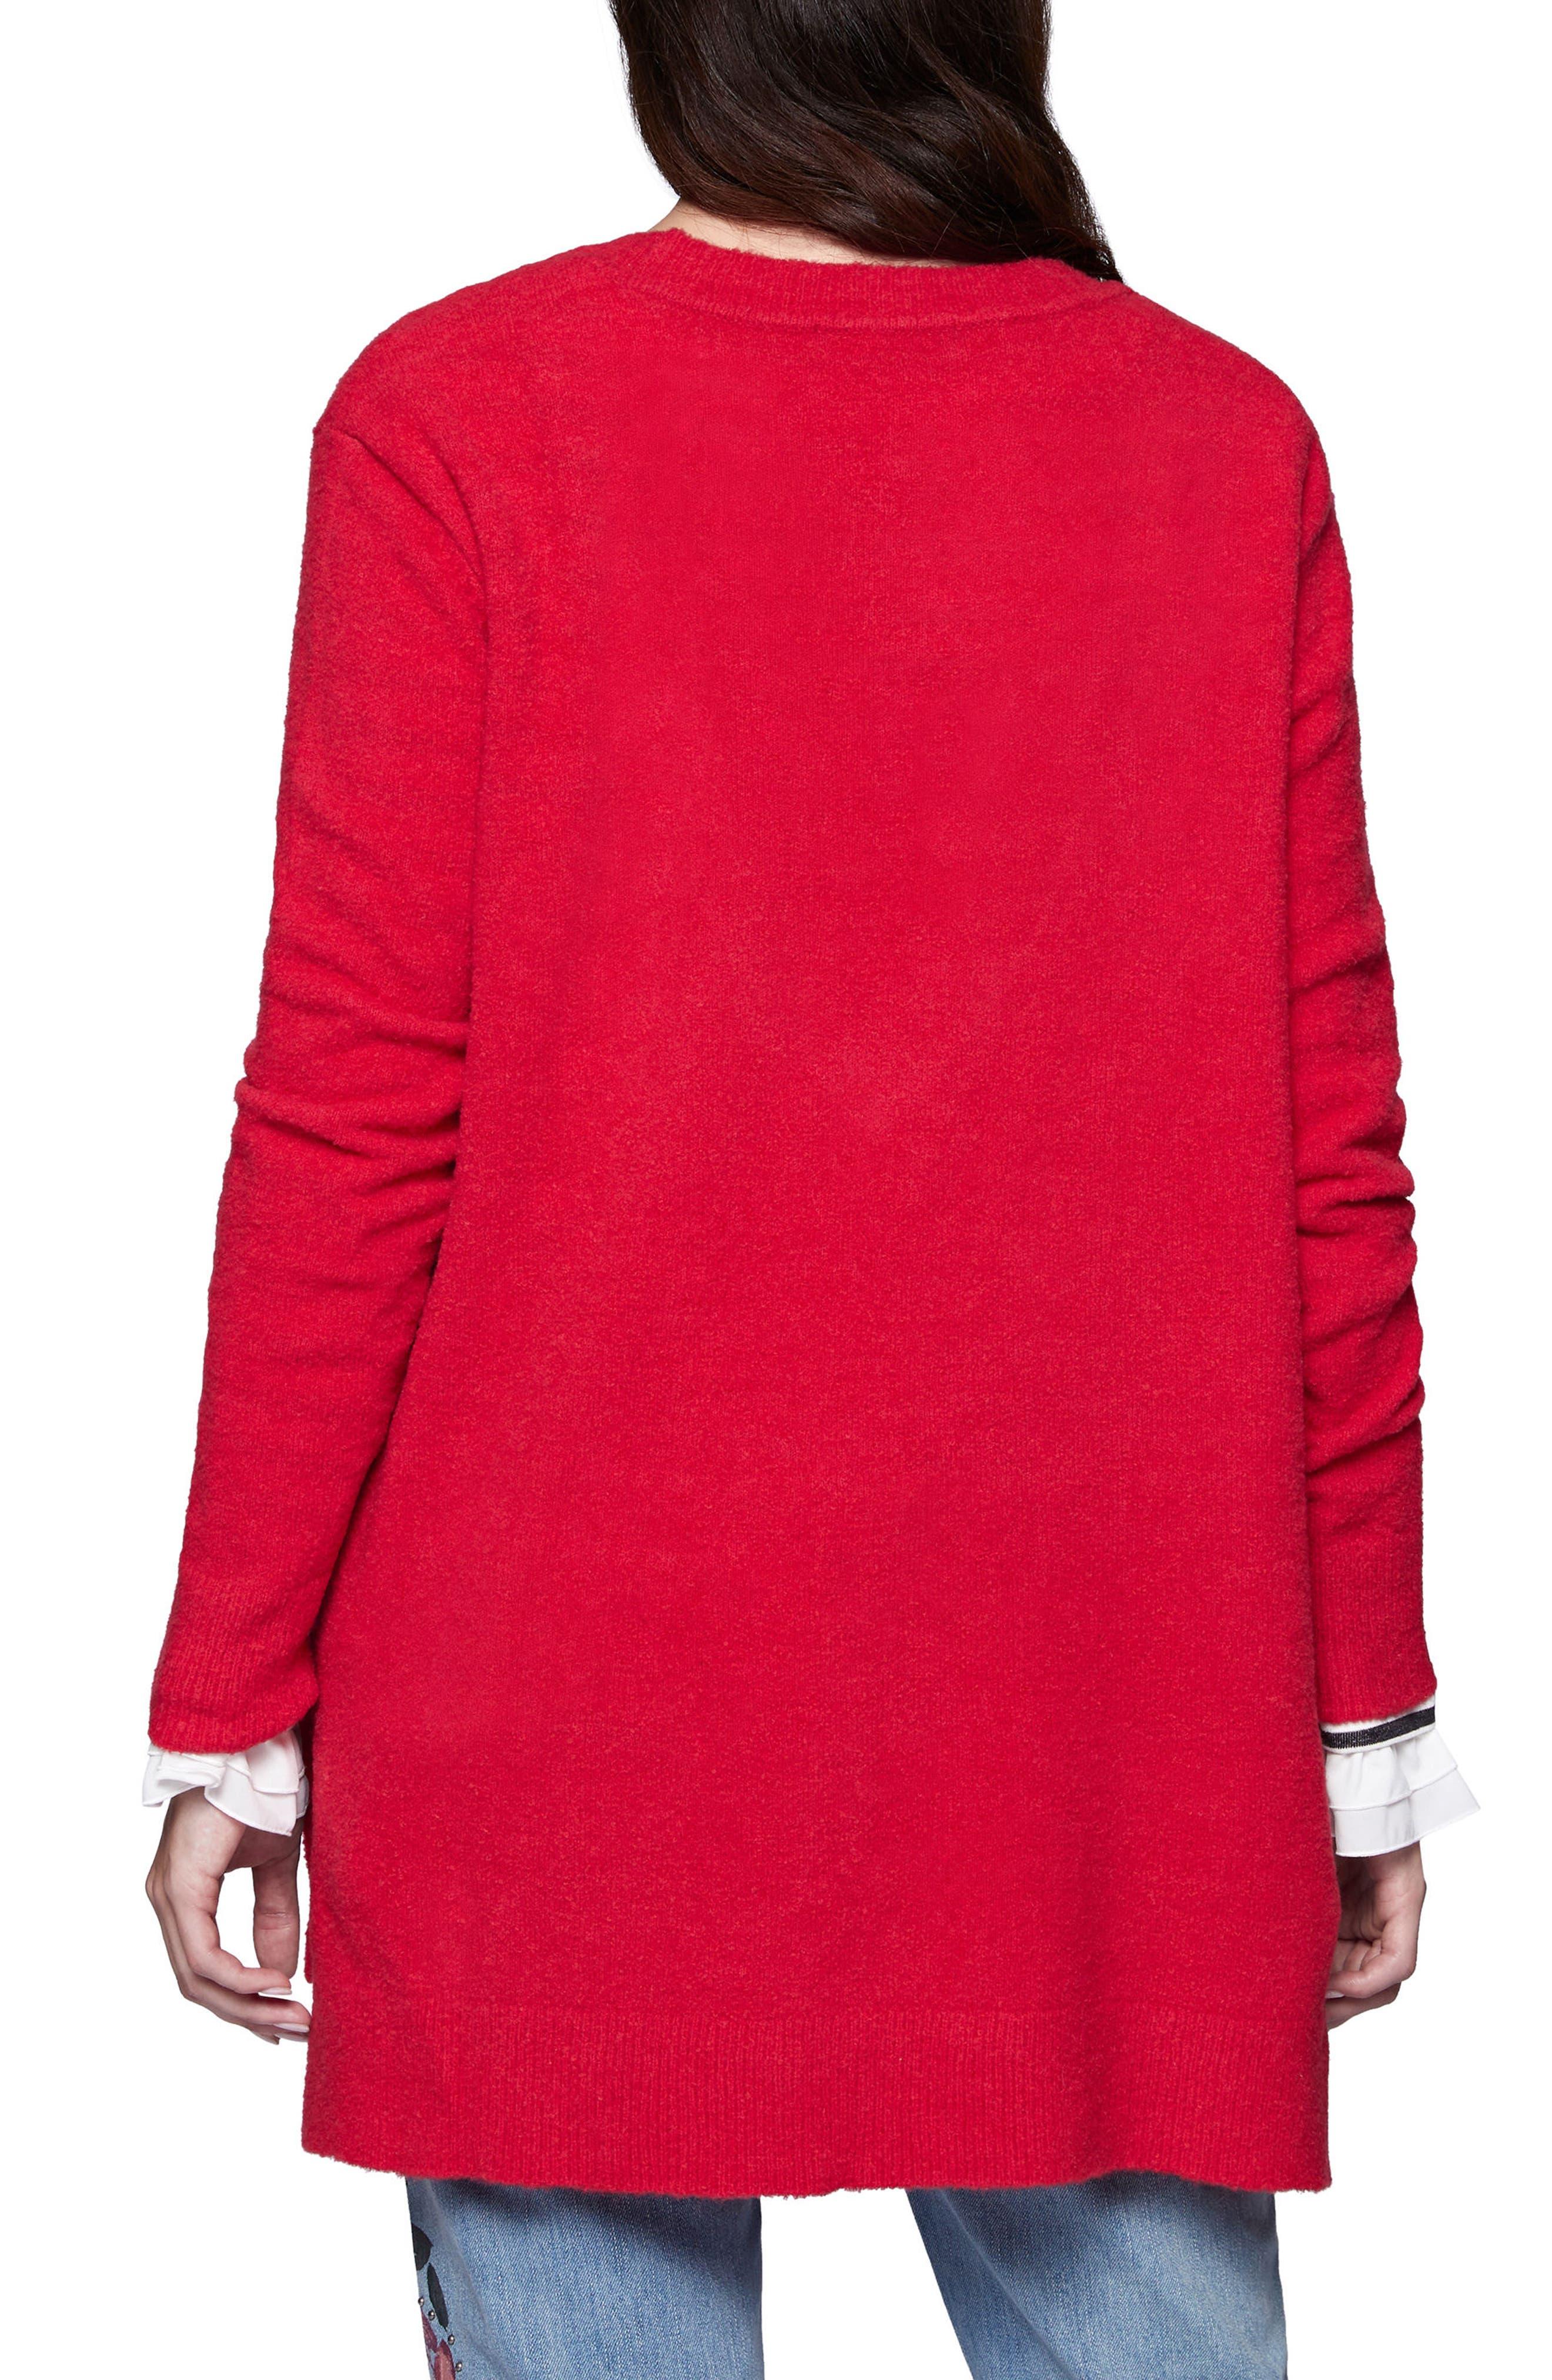 Santuary Delancey V-Neck Sweater,                             Alternate thumbnail 6, color,